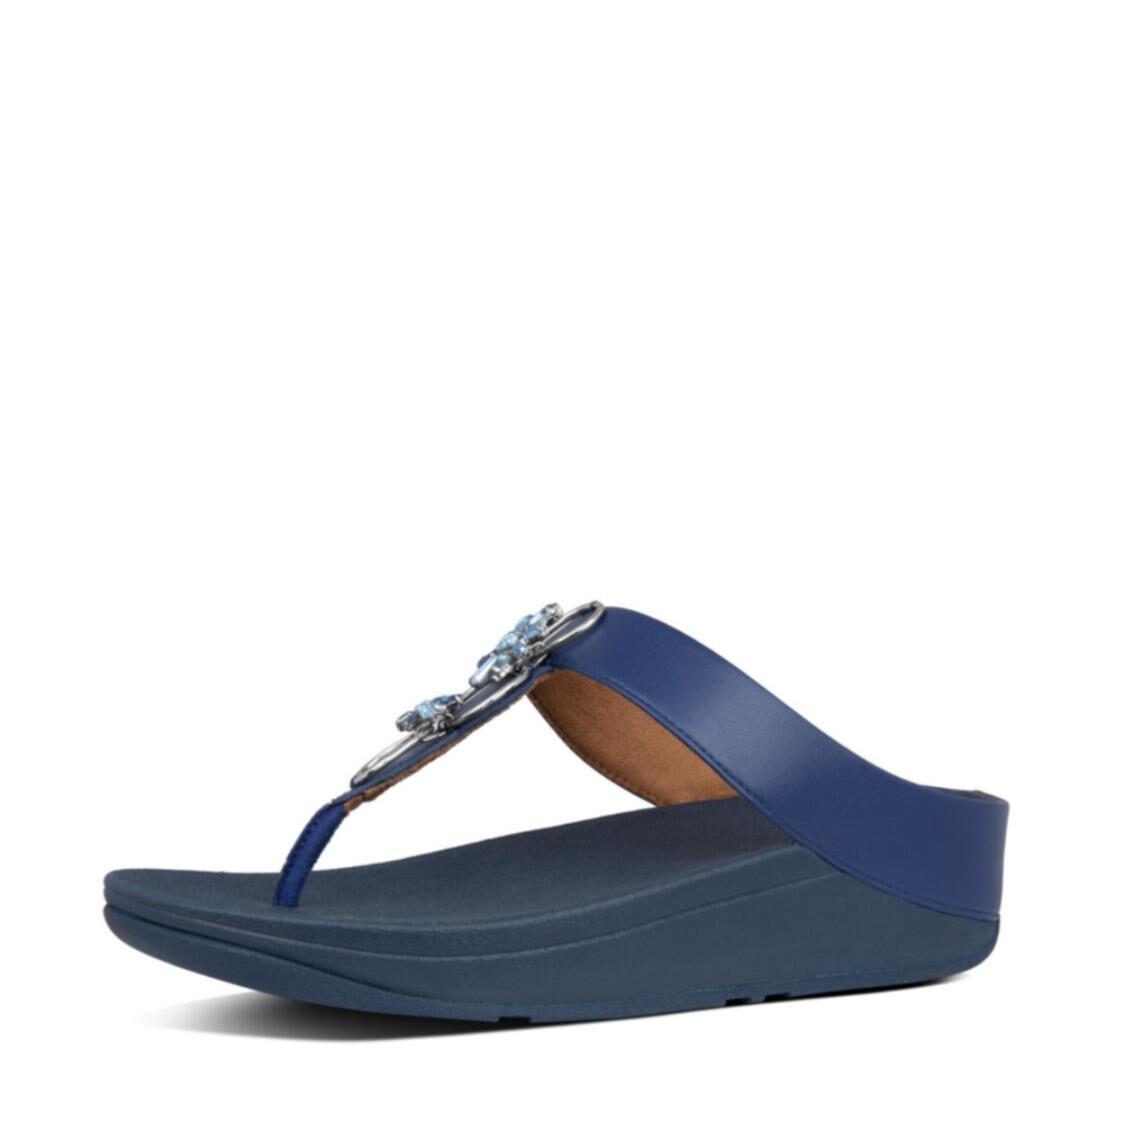 Fitflop Fino Blossom Toe Thongs Aurora Blue Y08-733